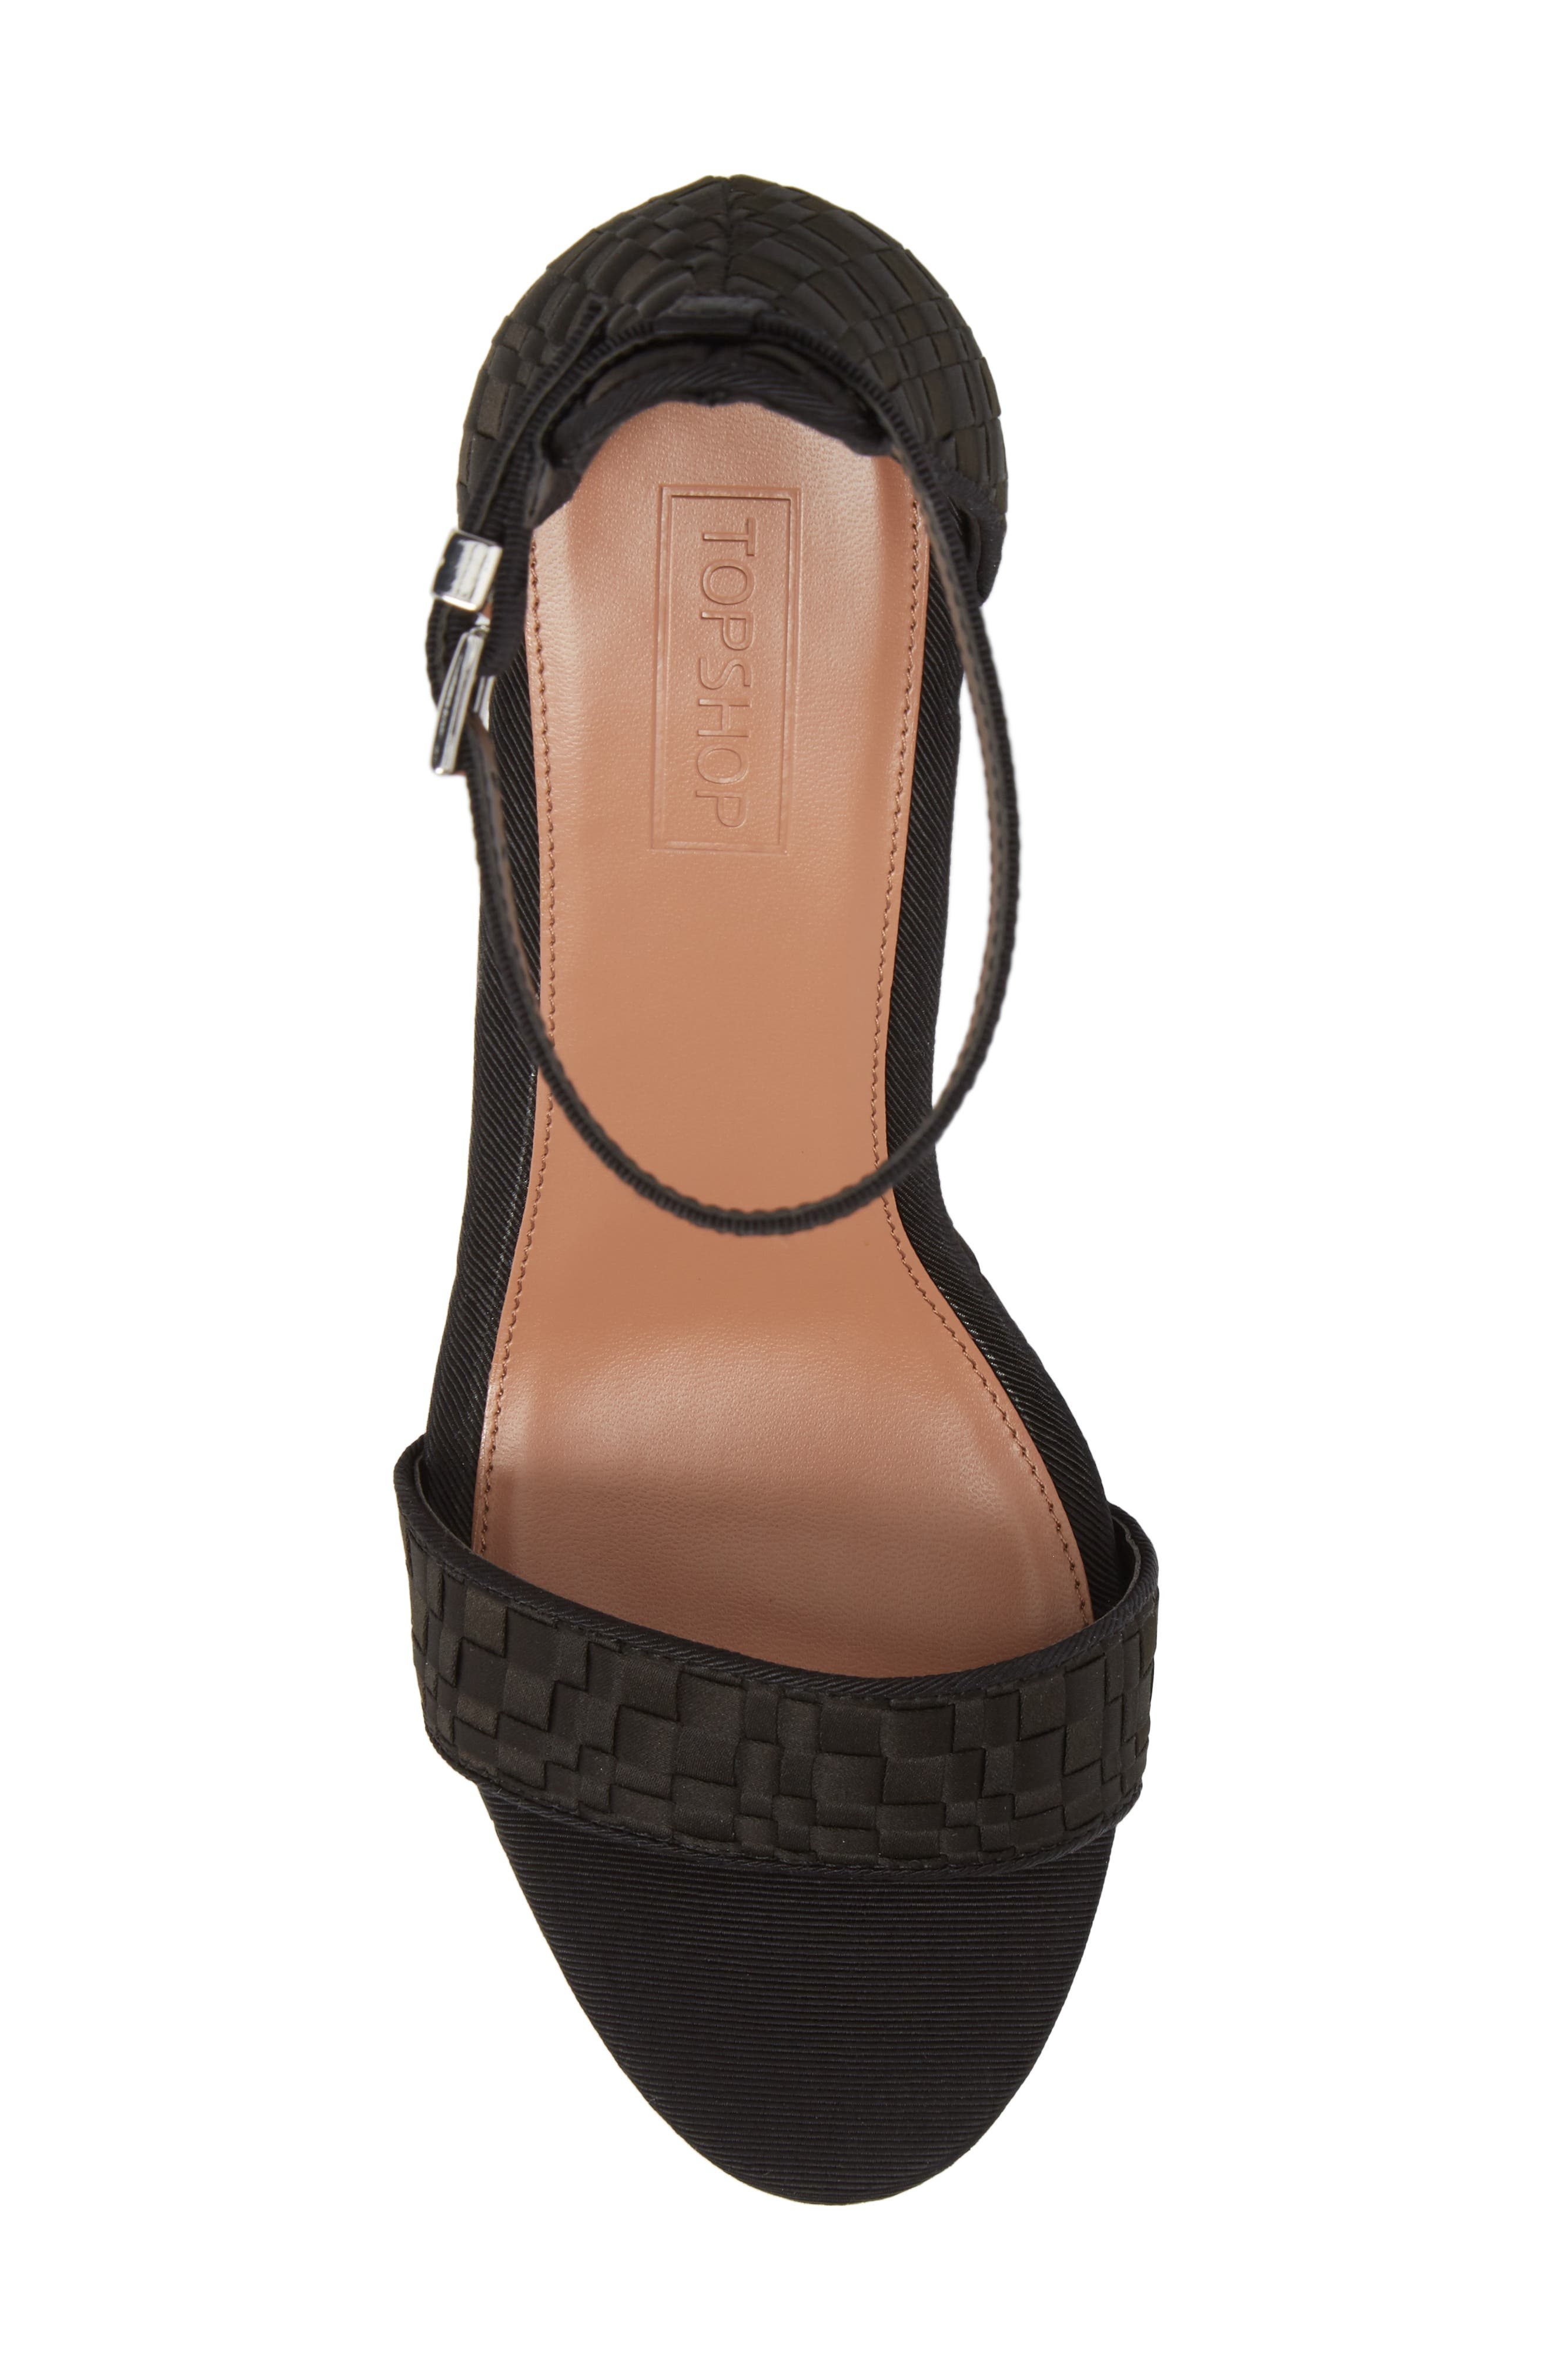 Sloane Woven Platform Sandal,                             Alternate thumbnail 5, color,                             001